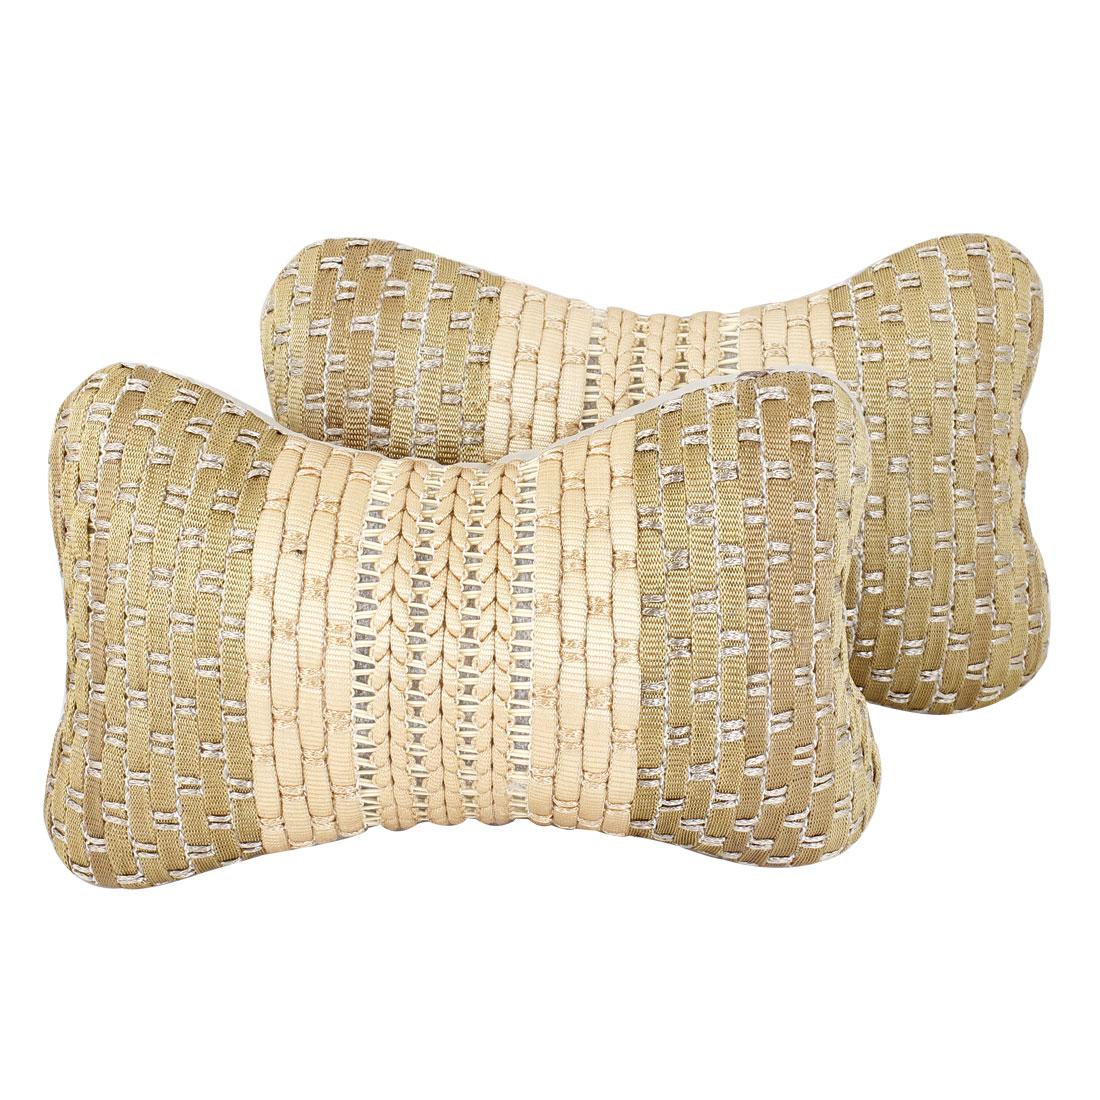 Home Car Sponge Stuffed Zip up Head Supporter Pillow Pale Apricot Khaki x 2